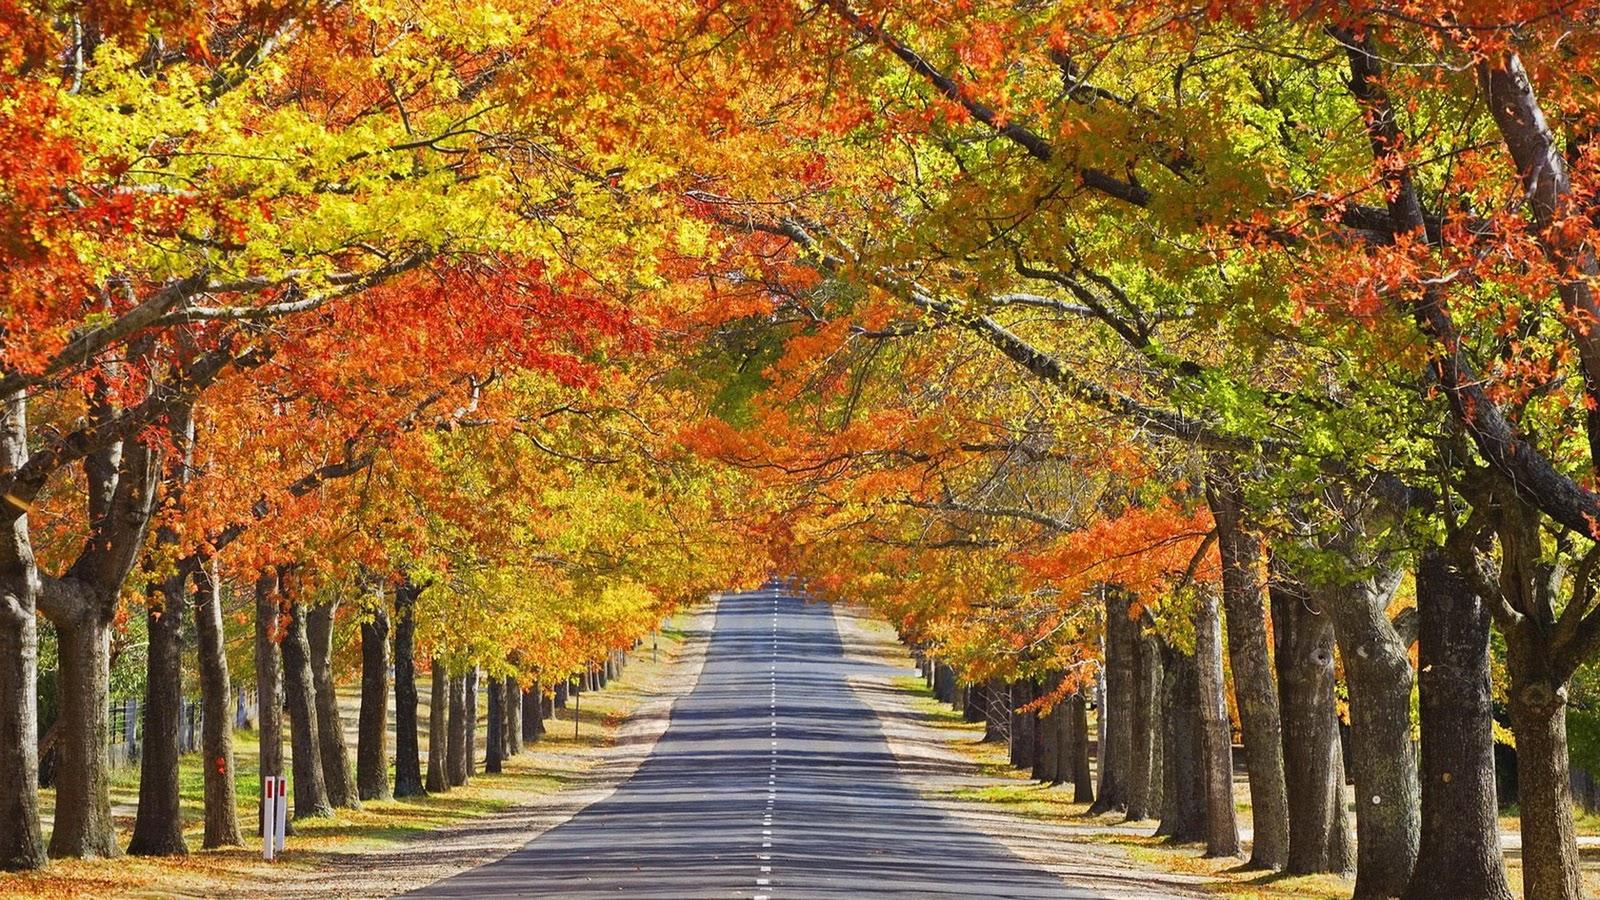 Fall Season Wallpaper for Desktop Desktop Image 1600x900